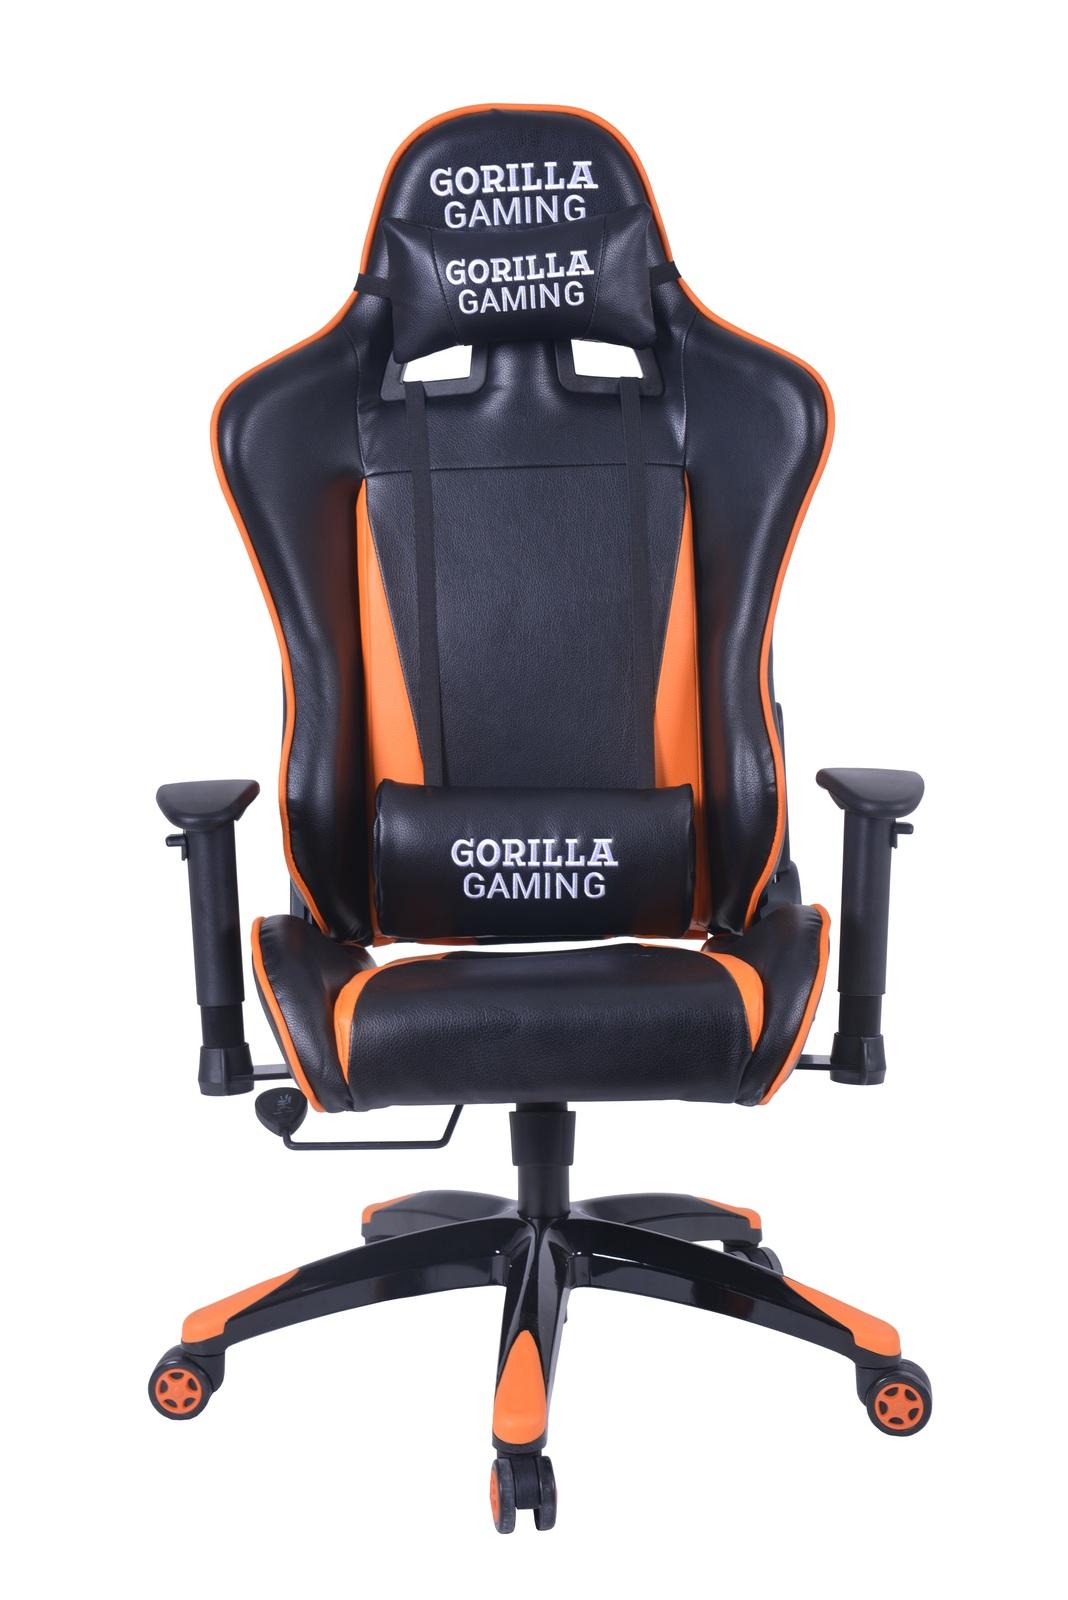 Gorilla Gaming Commander Chair - Orange & Black for  image